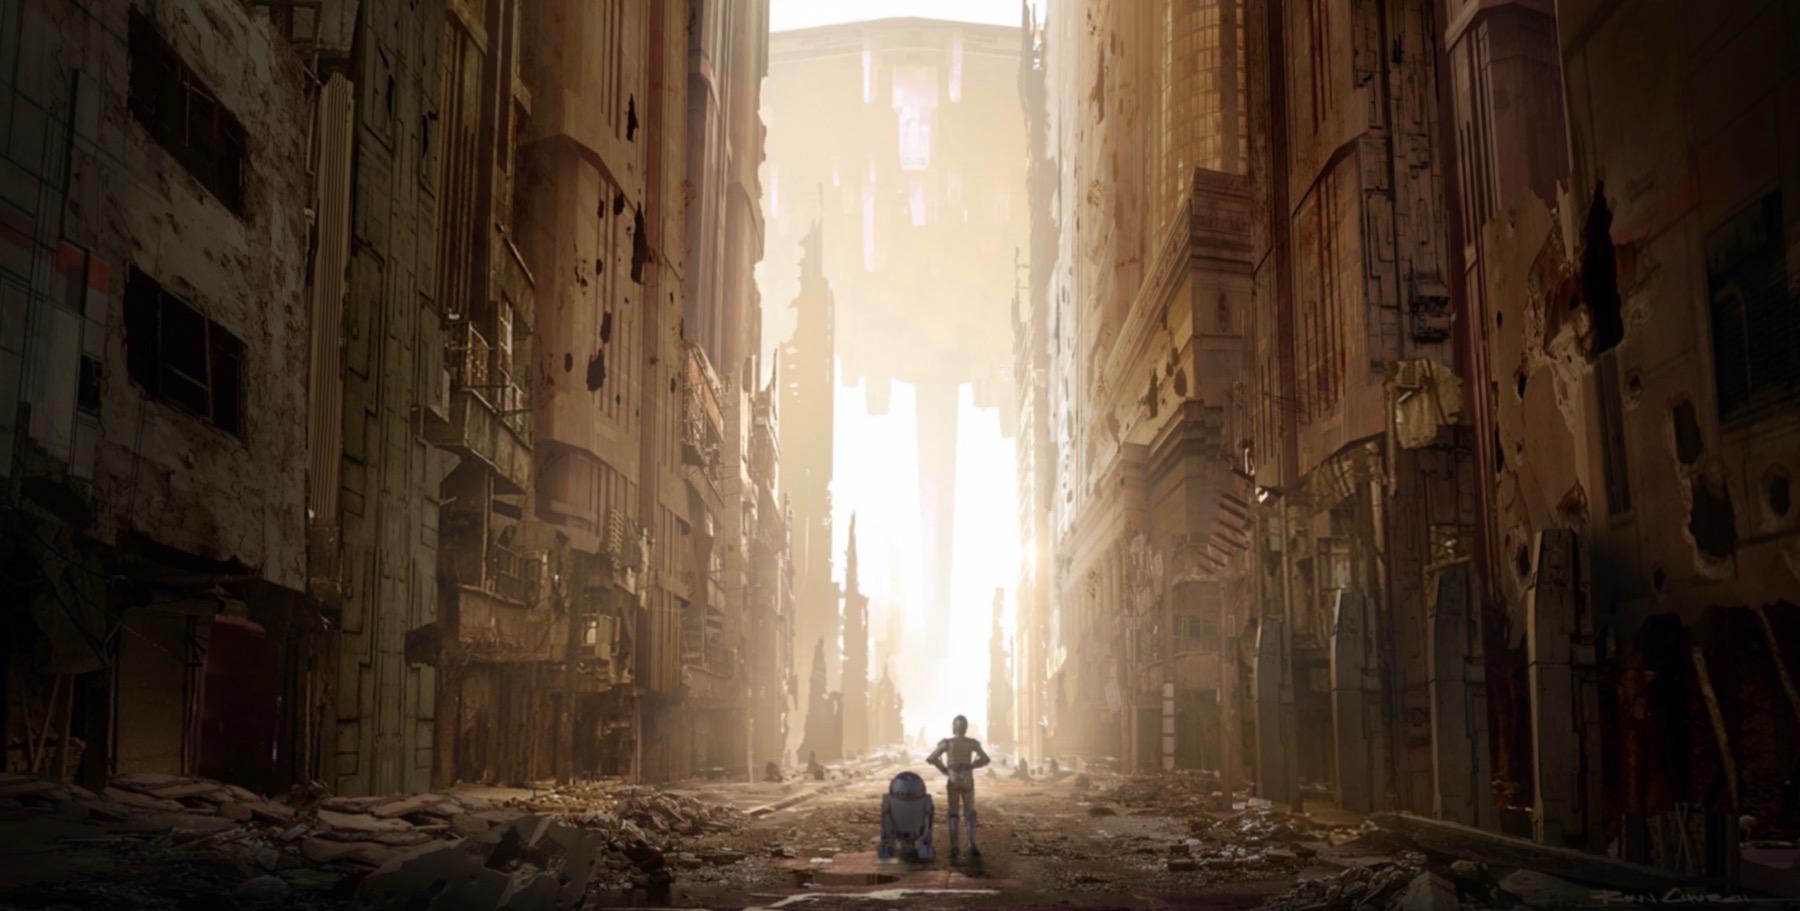 Колин Треворроу концепт-арты фильма Дуэль судеб C3PO и R2D2 на улицах Корусанта